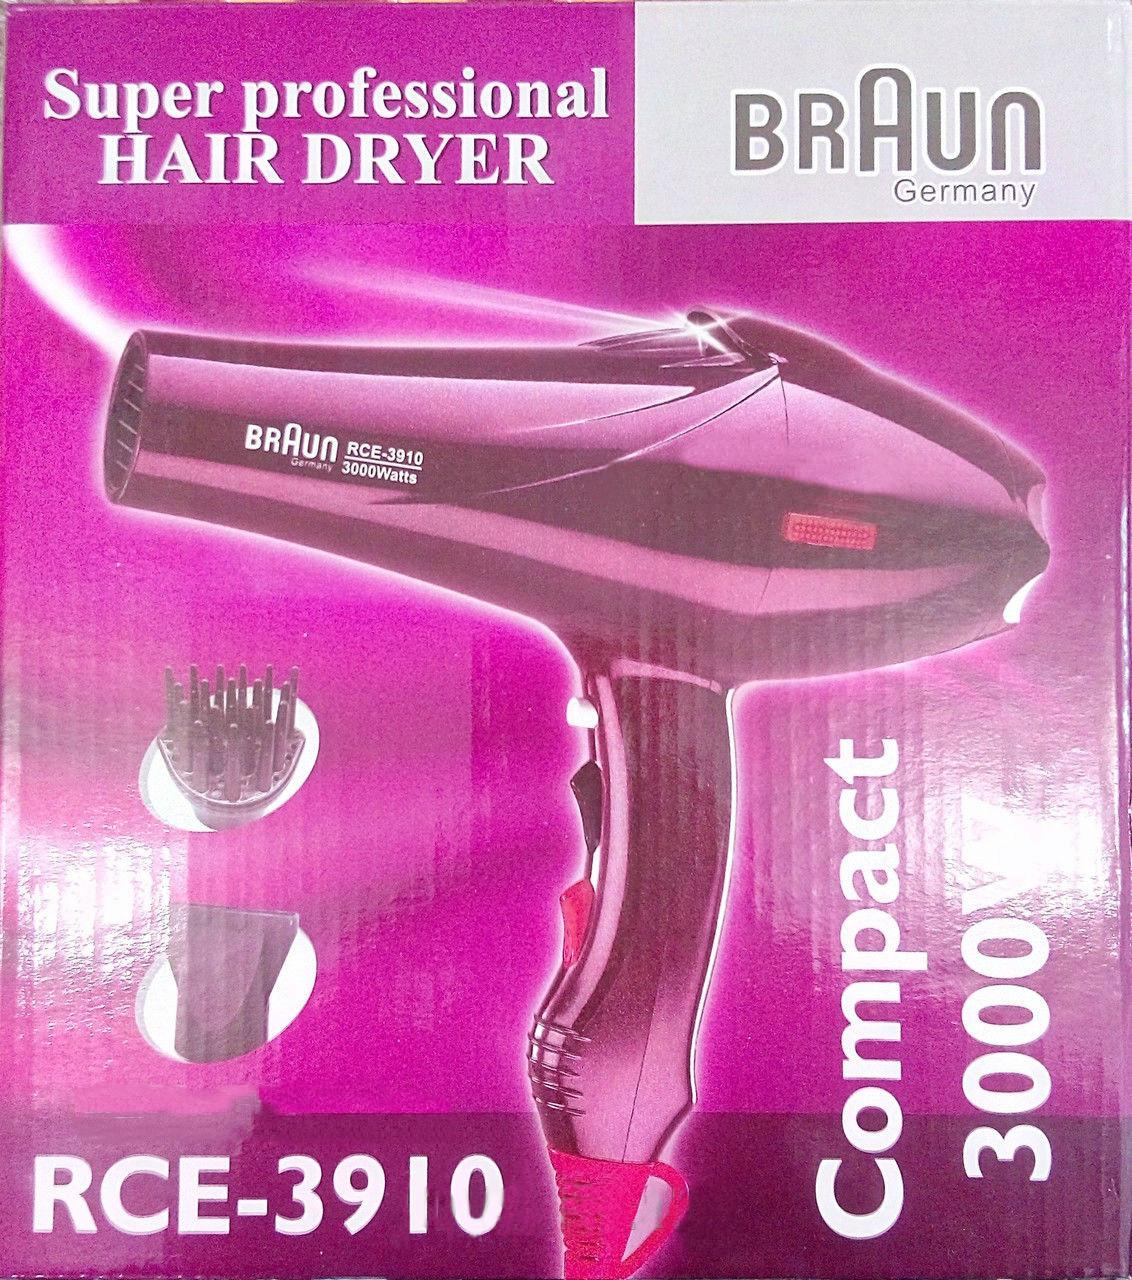 Фен для сушки волос Braun Super Professional Hair Dryer RCE-3910